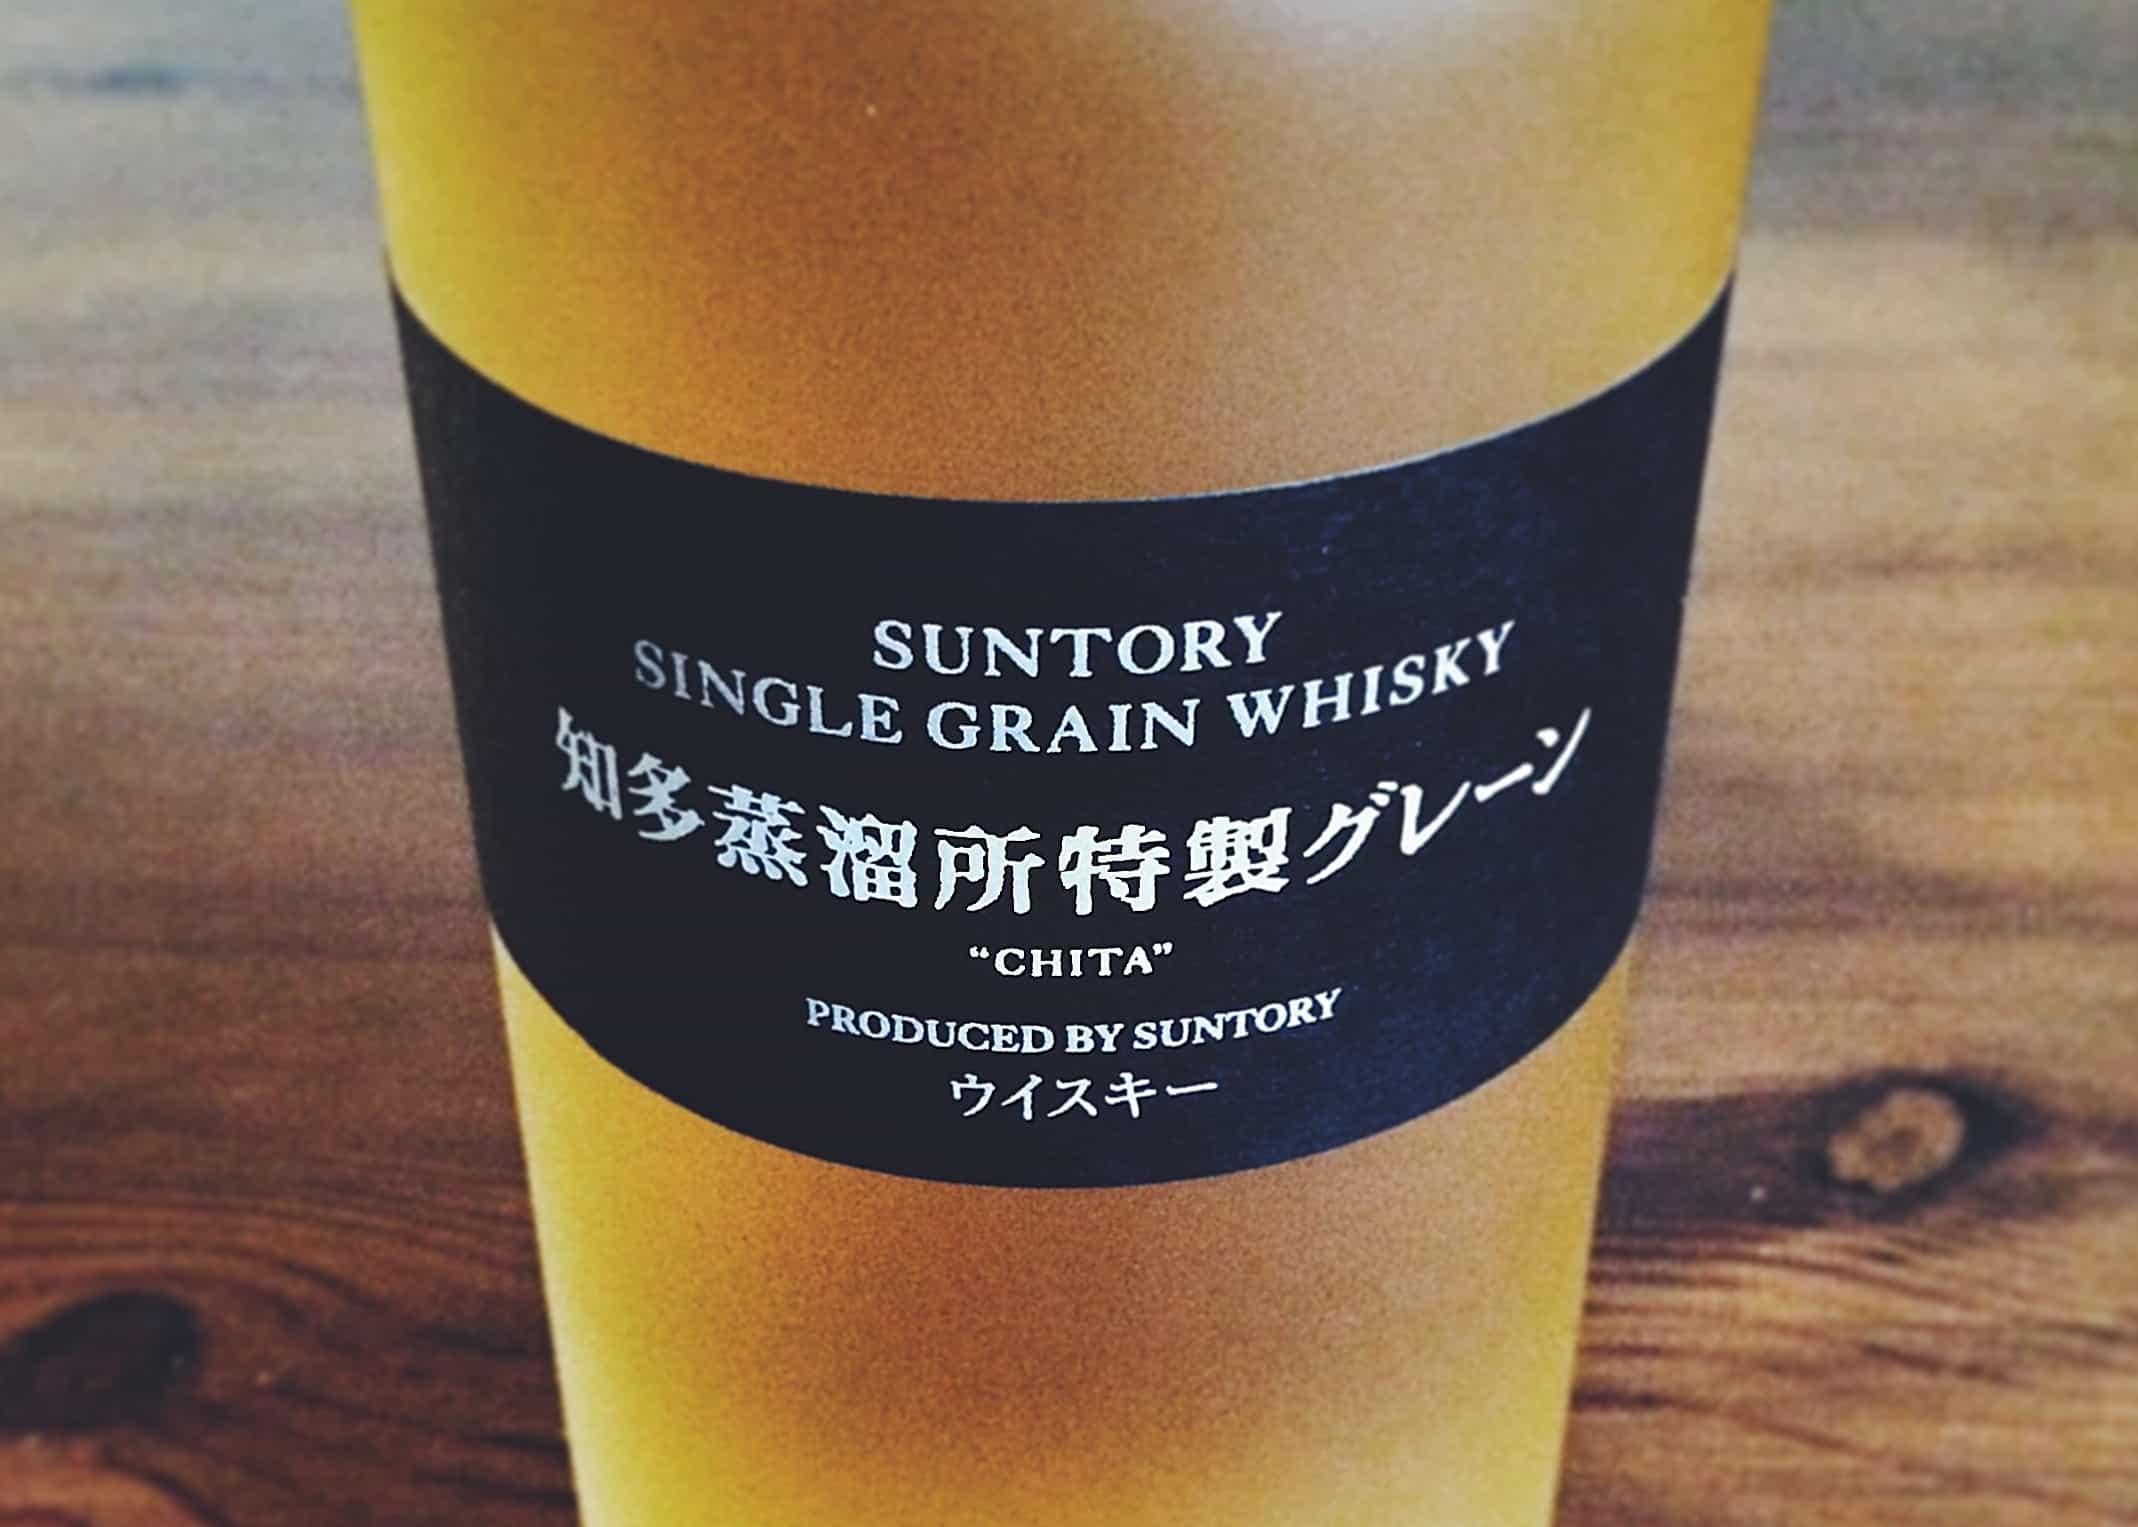 Chita Single Grain Whisky